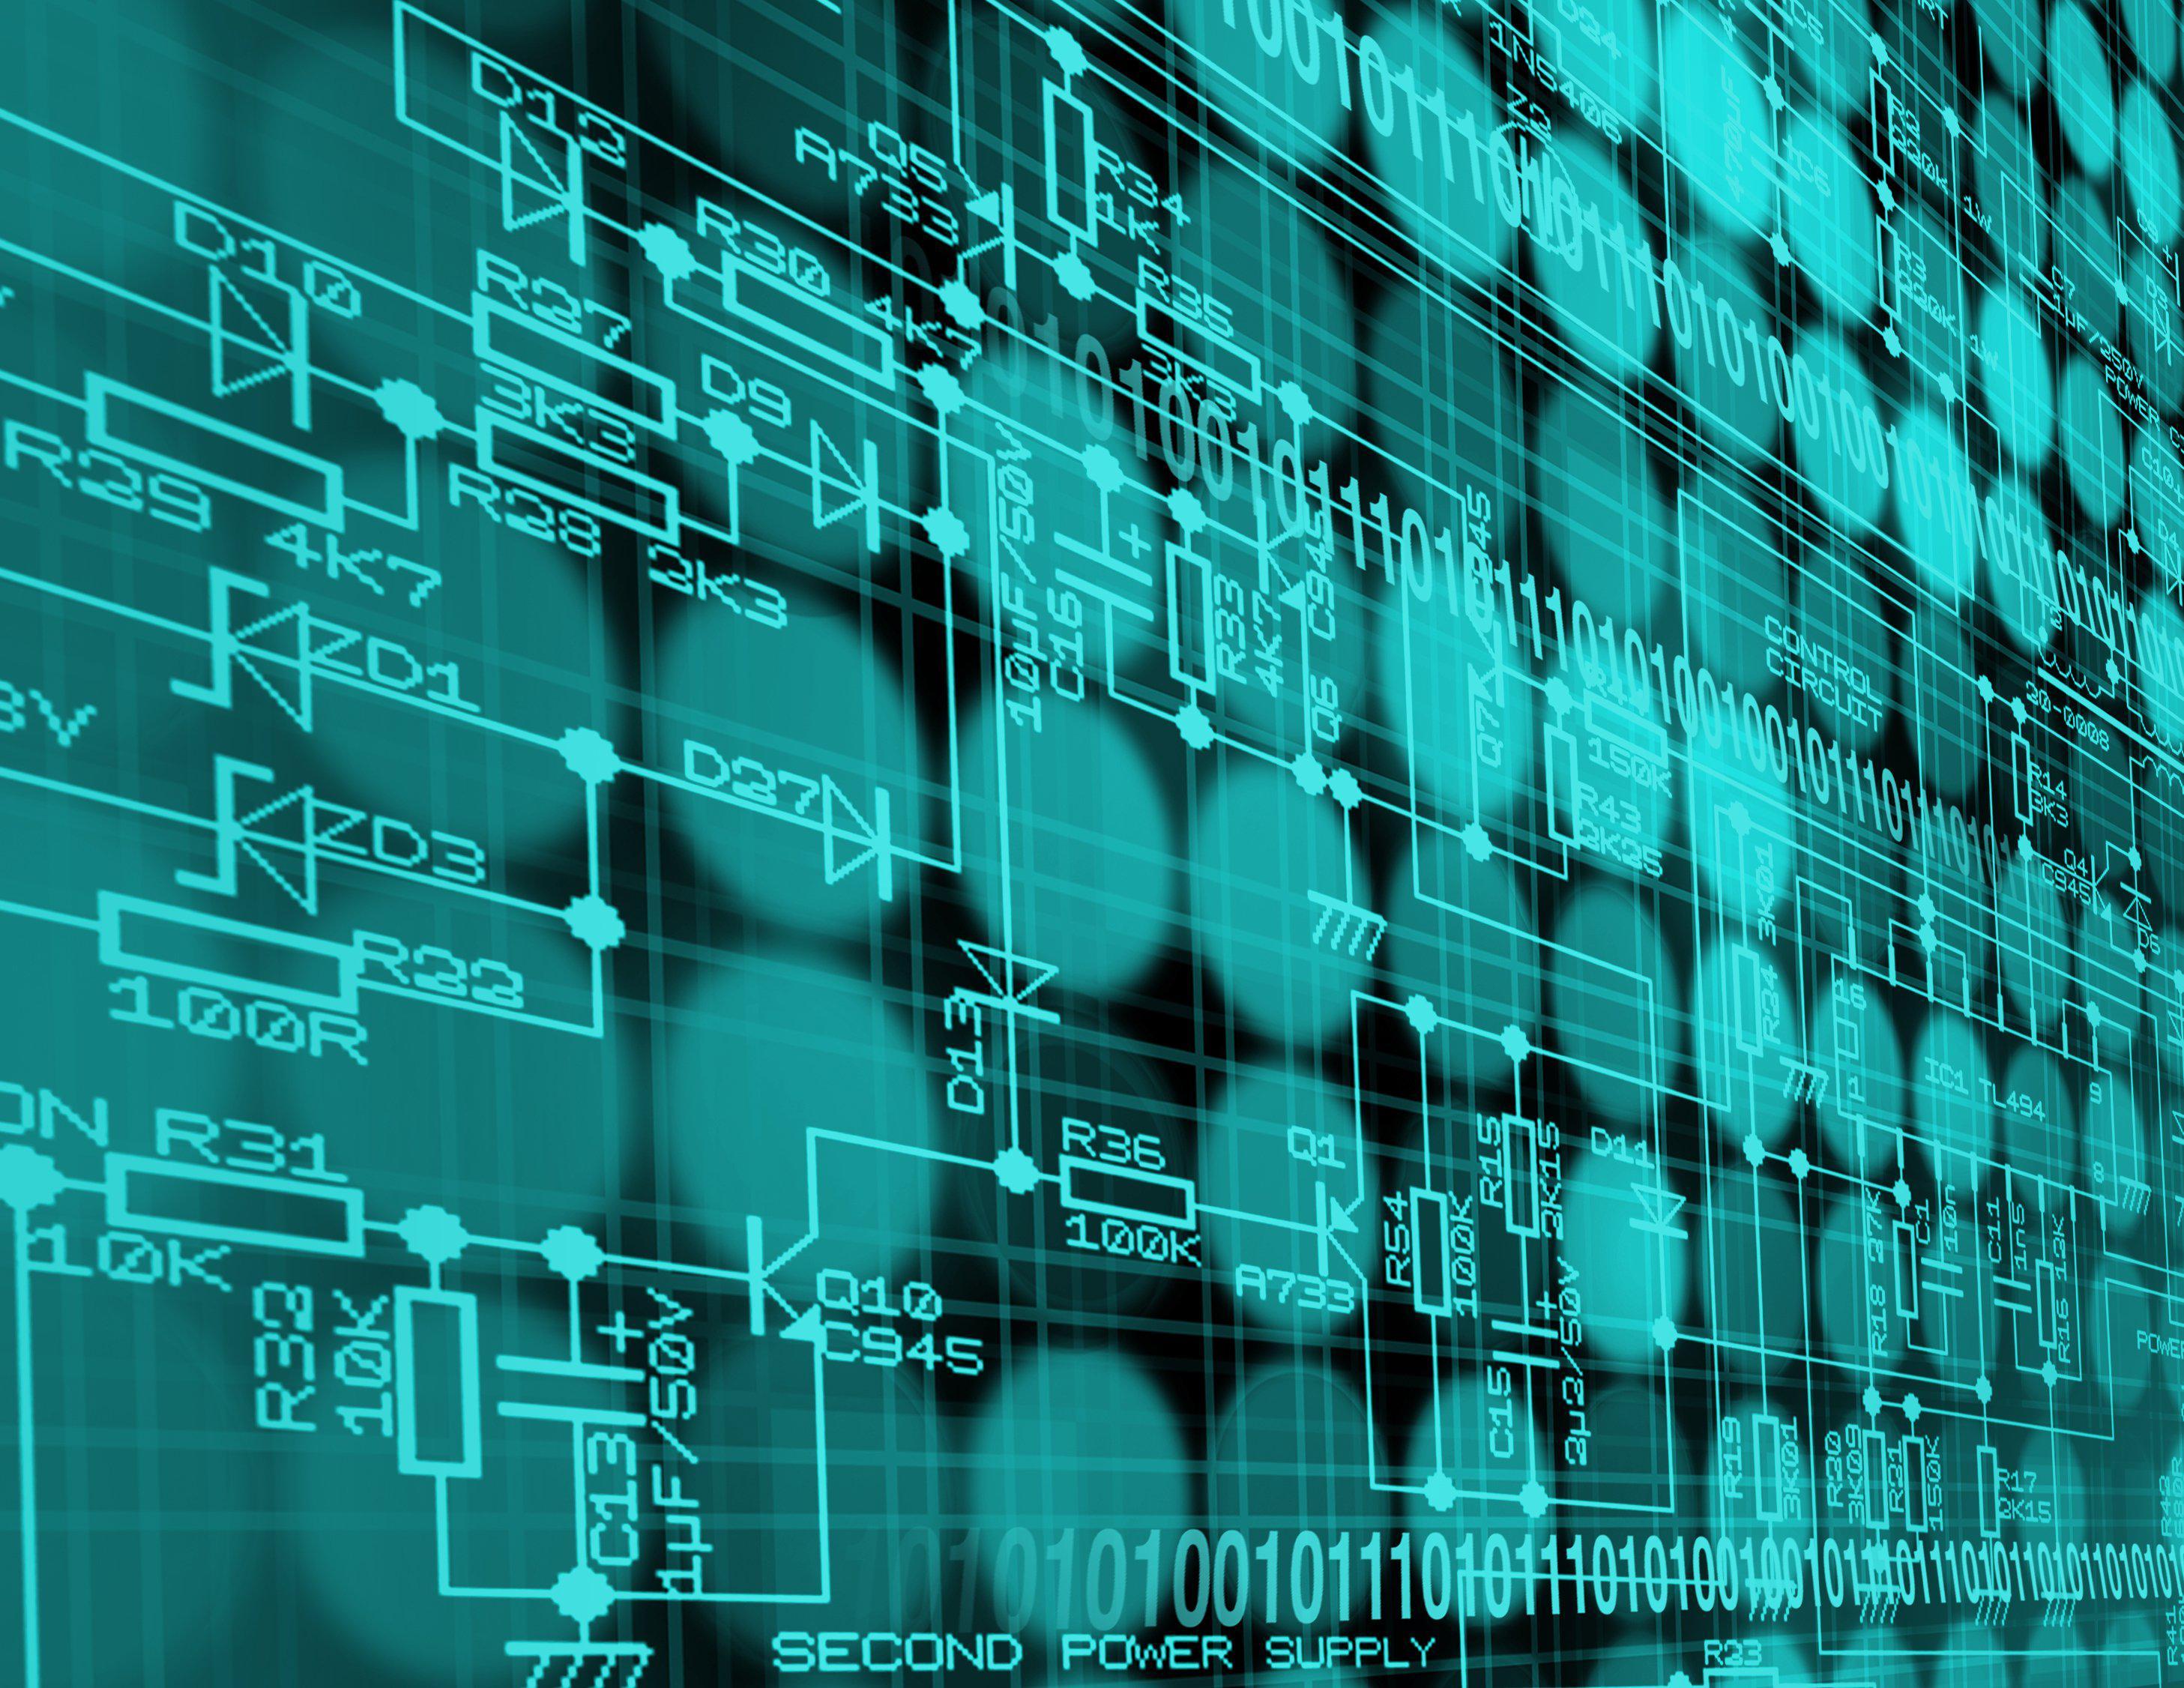 Danger 3d Wallpaper Download Hd Computer Virus Danger Hacking Hacker Internet Sadic